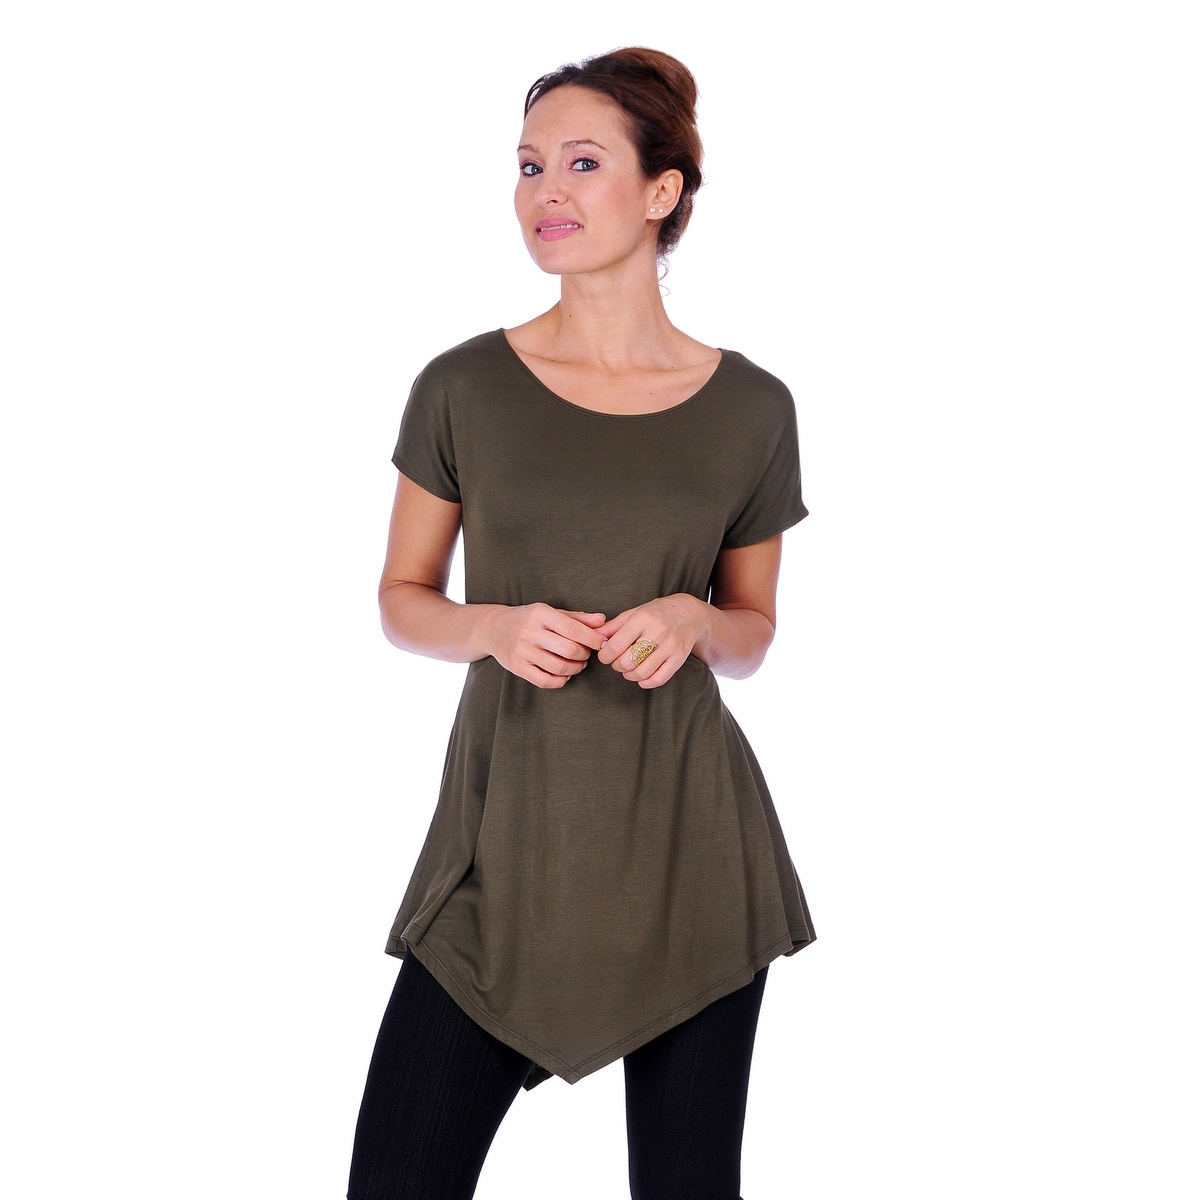 Simply Ravishing Women's Assymetrical Front/Back Handkerchief Hem Sleeveless Tunic Top - Thumbnail 4